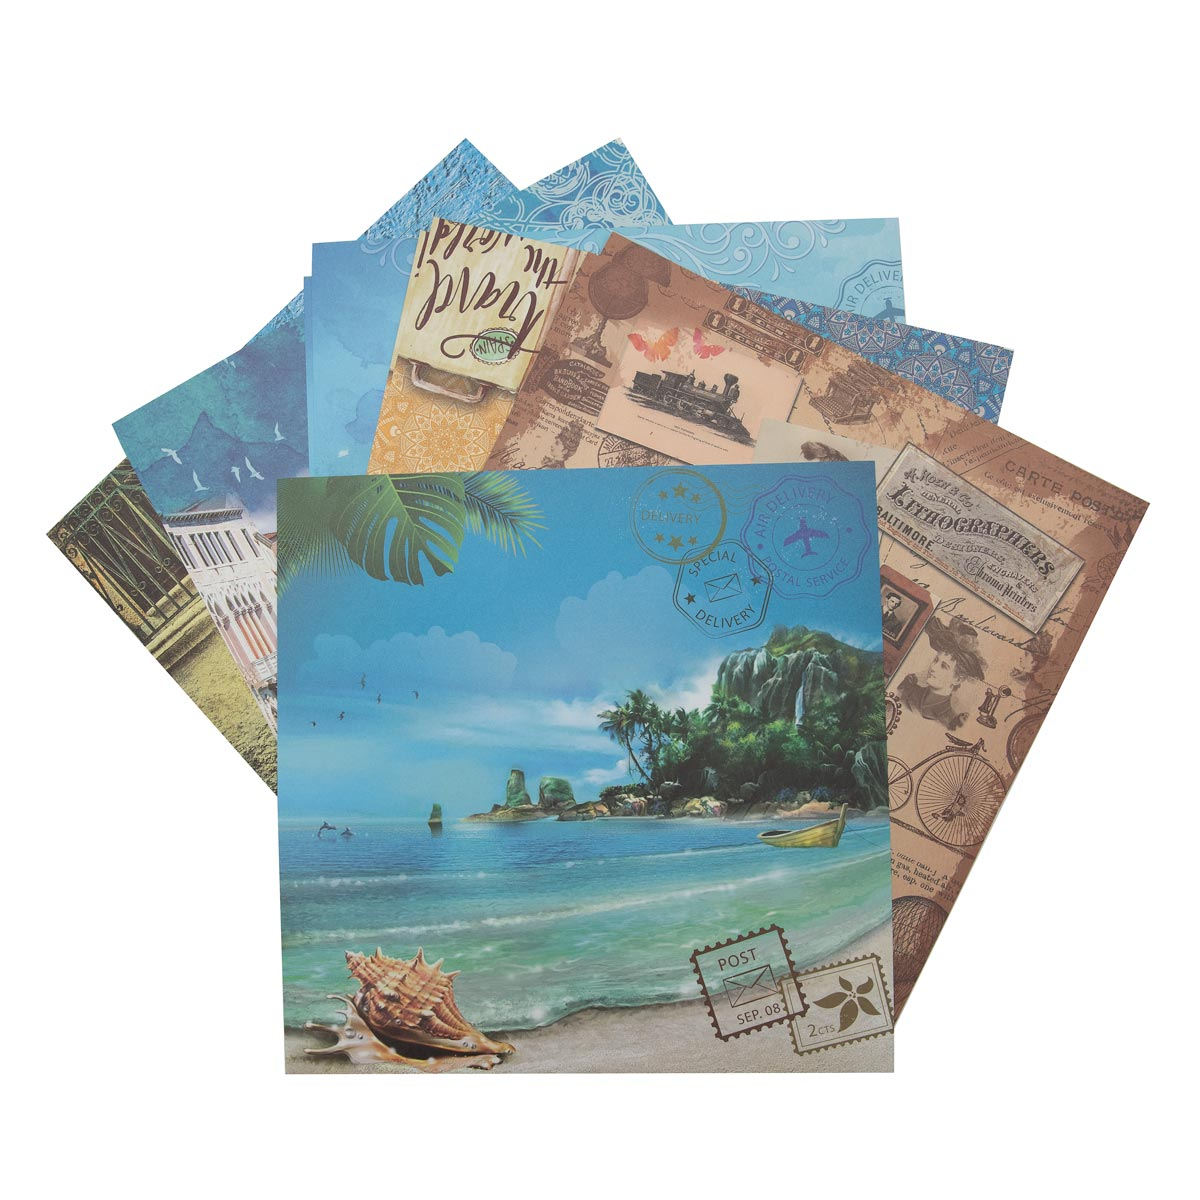 С2782-05 Цветная бумага для скрапбукинга. 12л. 30x30 'Отпуск'.